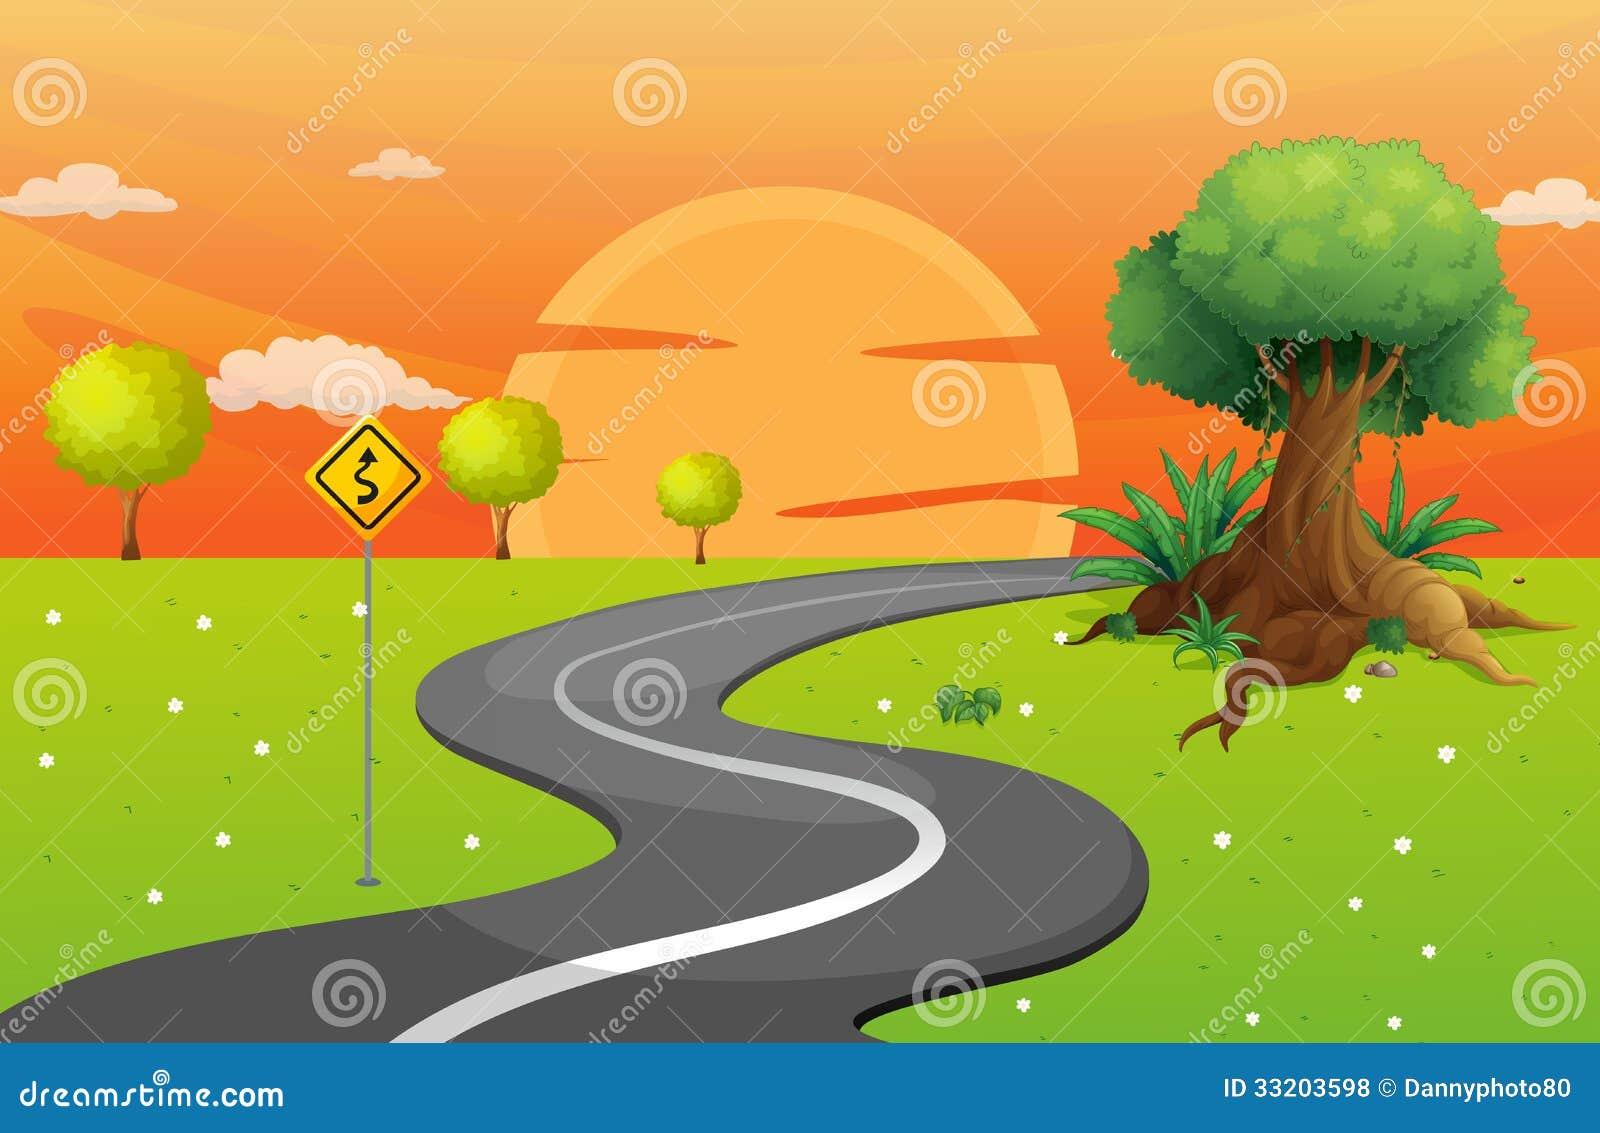 Winding Path Illustration winding-road-illustration-